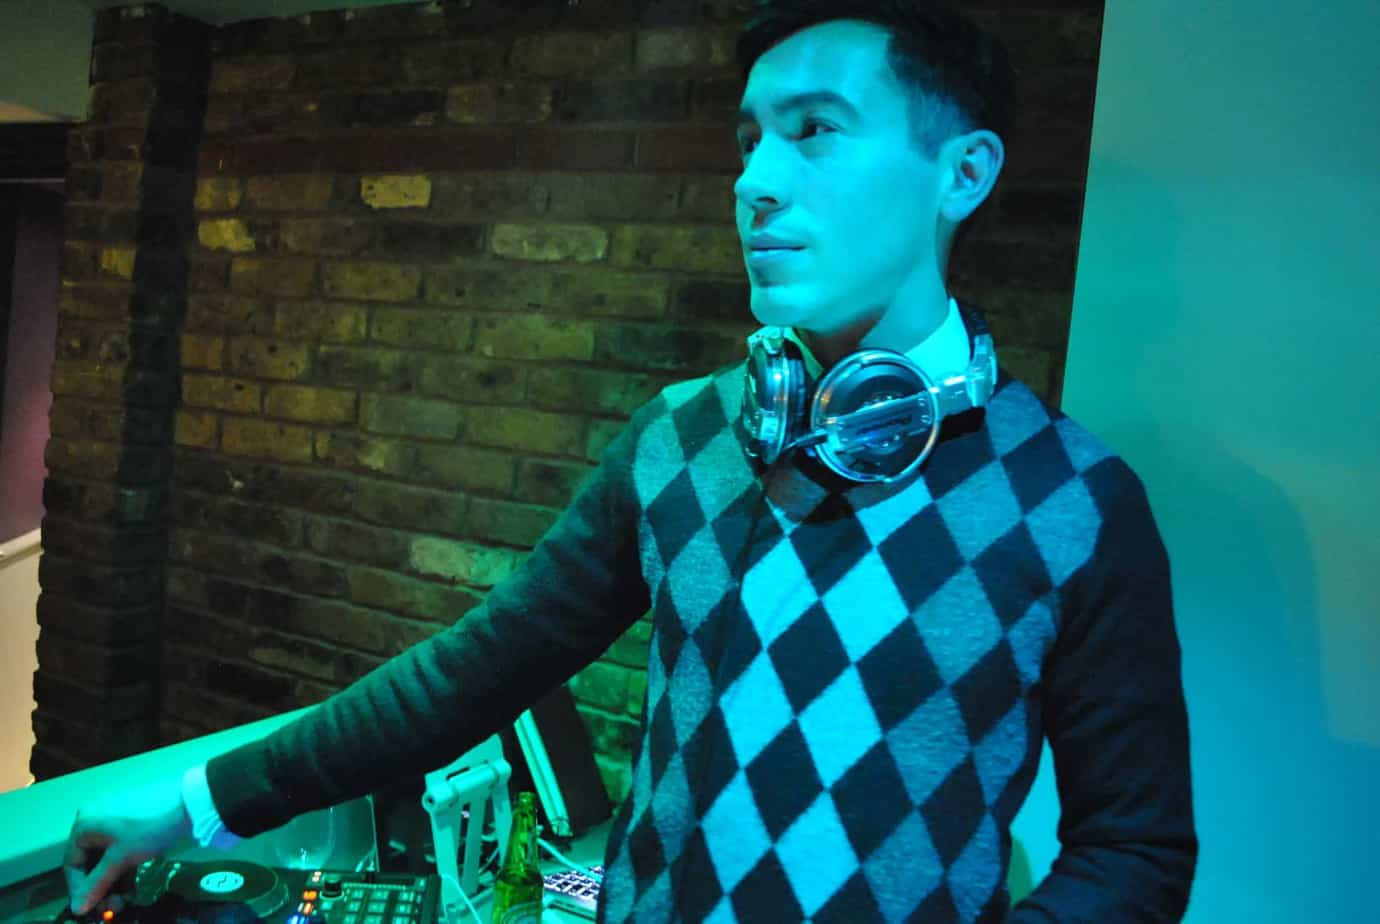 Billy Gonzalez @ Flute - Storm DJs